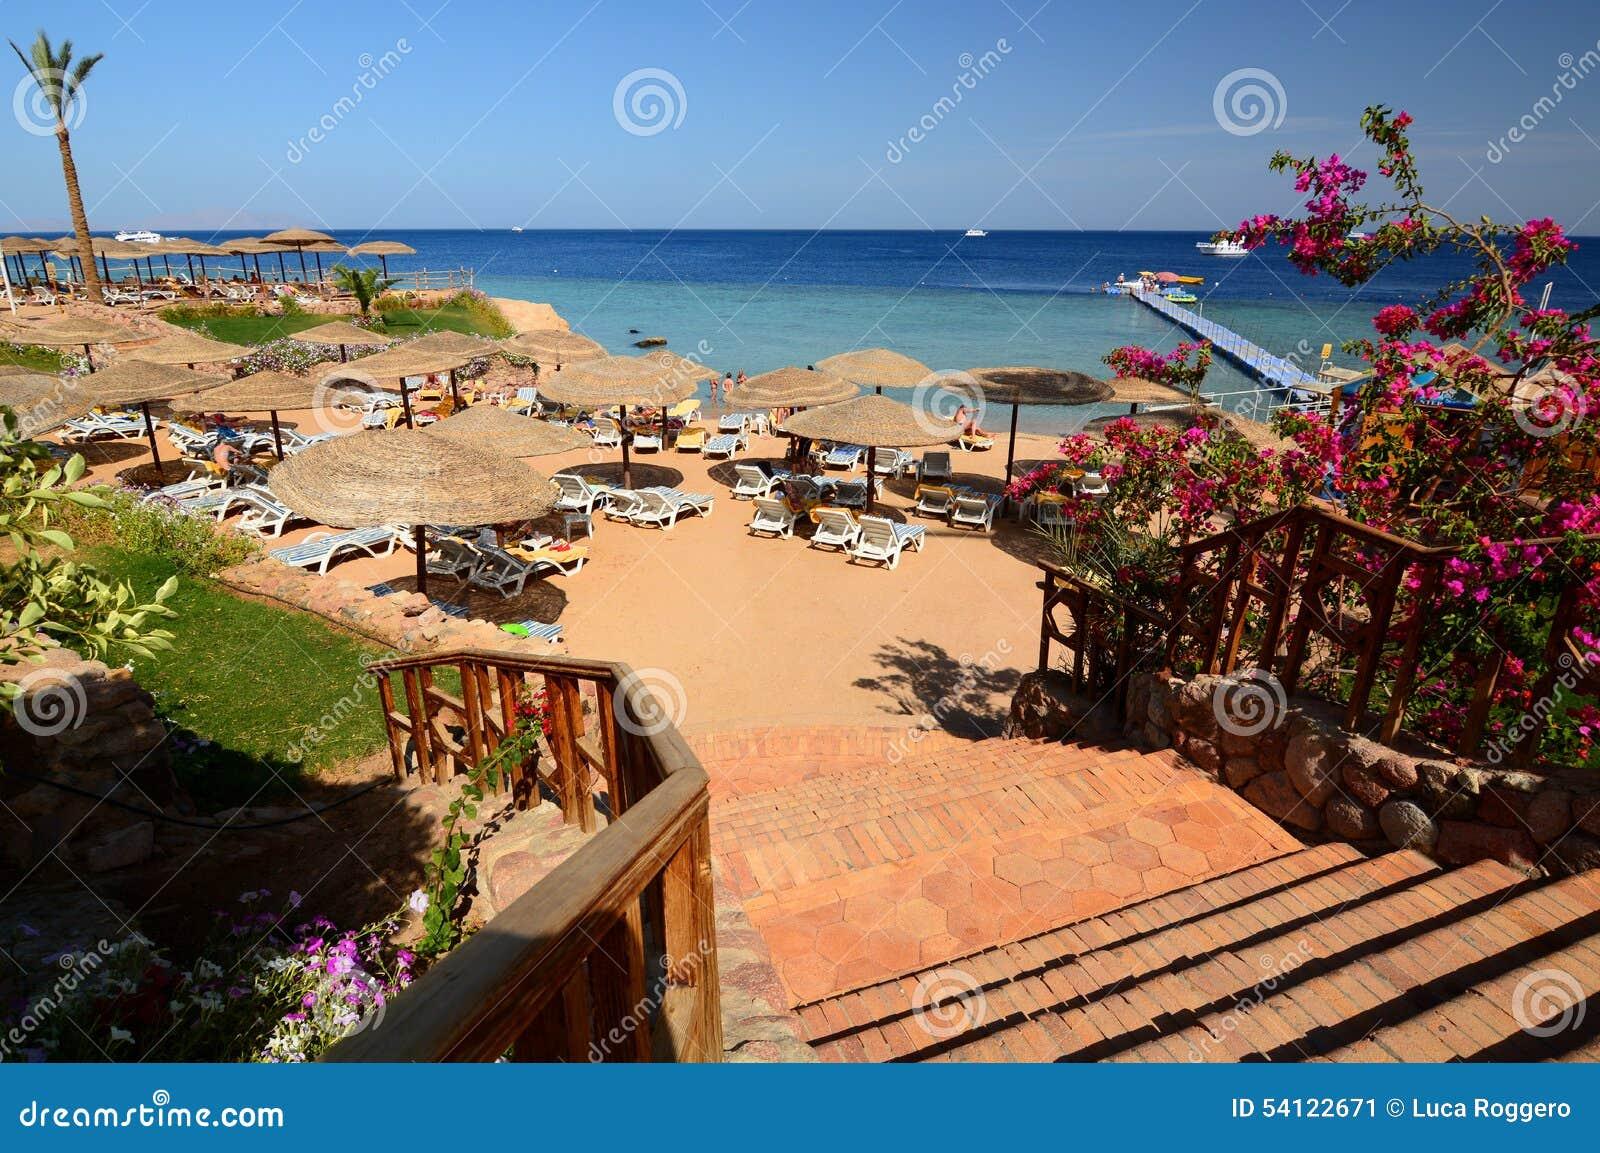 Touristic resort. Sharm El Sheikh. Red Sea. Egypt